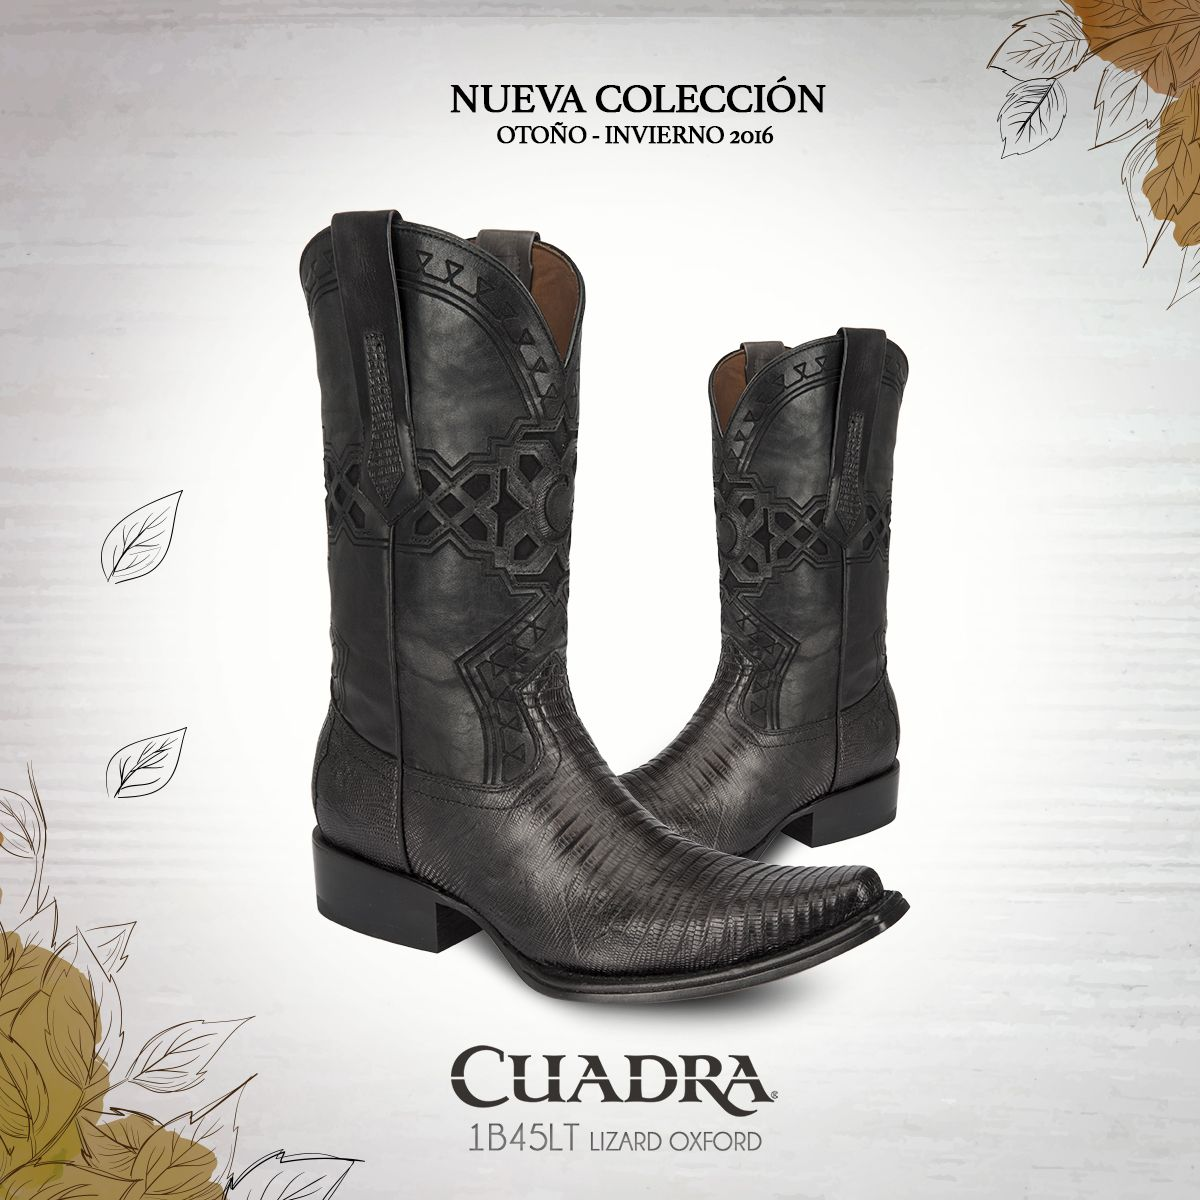 BOTA CUADRA ~ Bota tradicional de piel genuina de lizard con